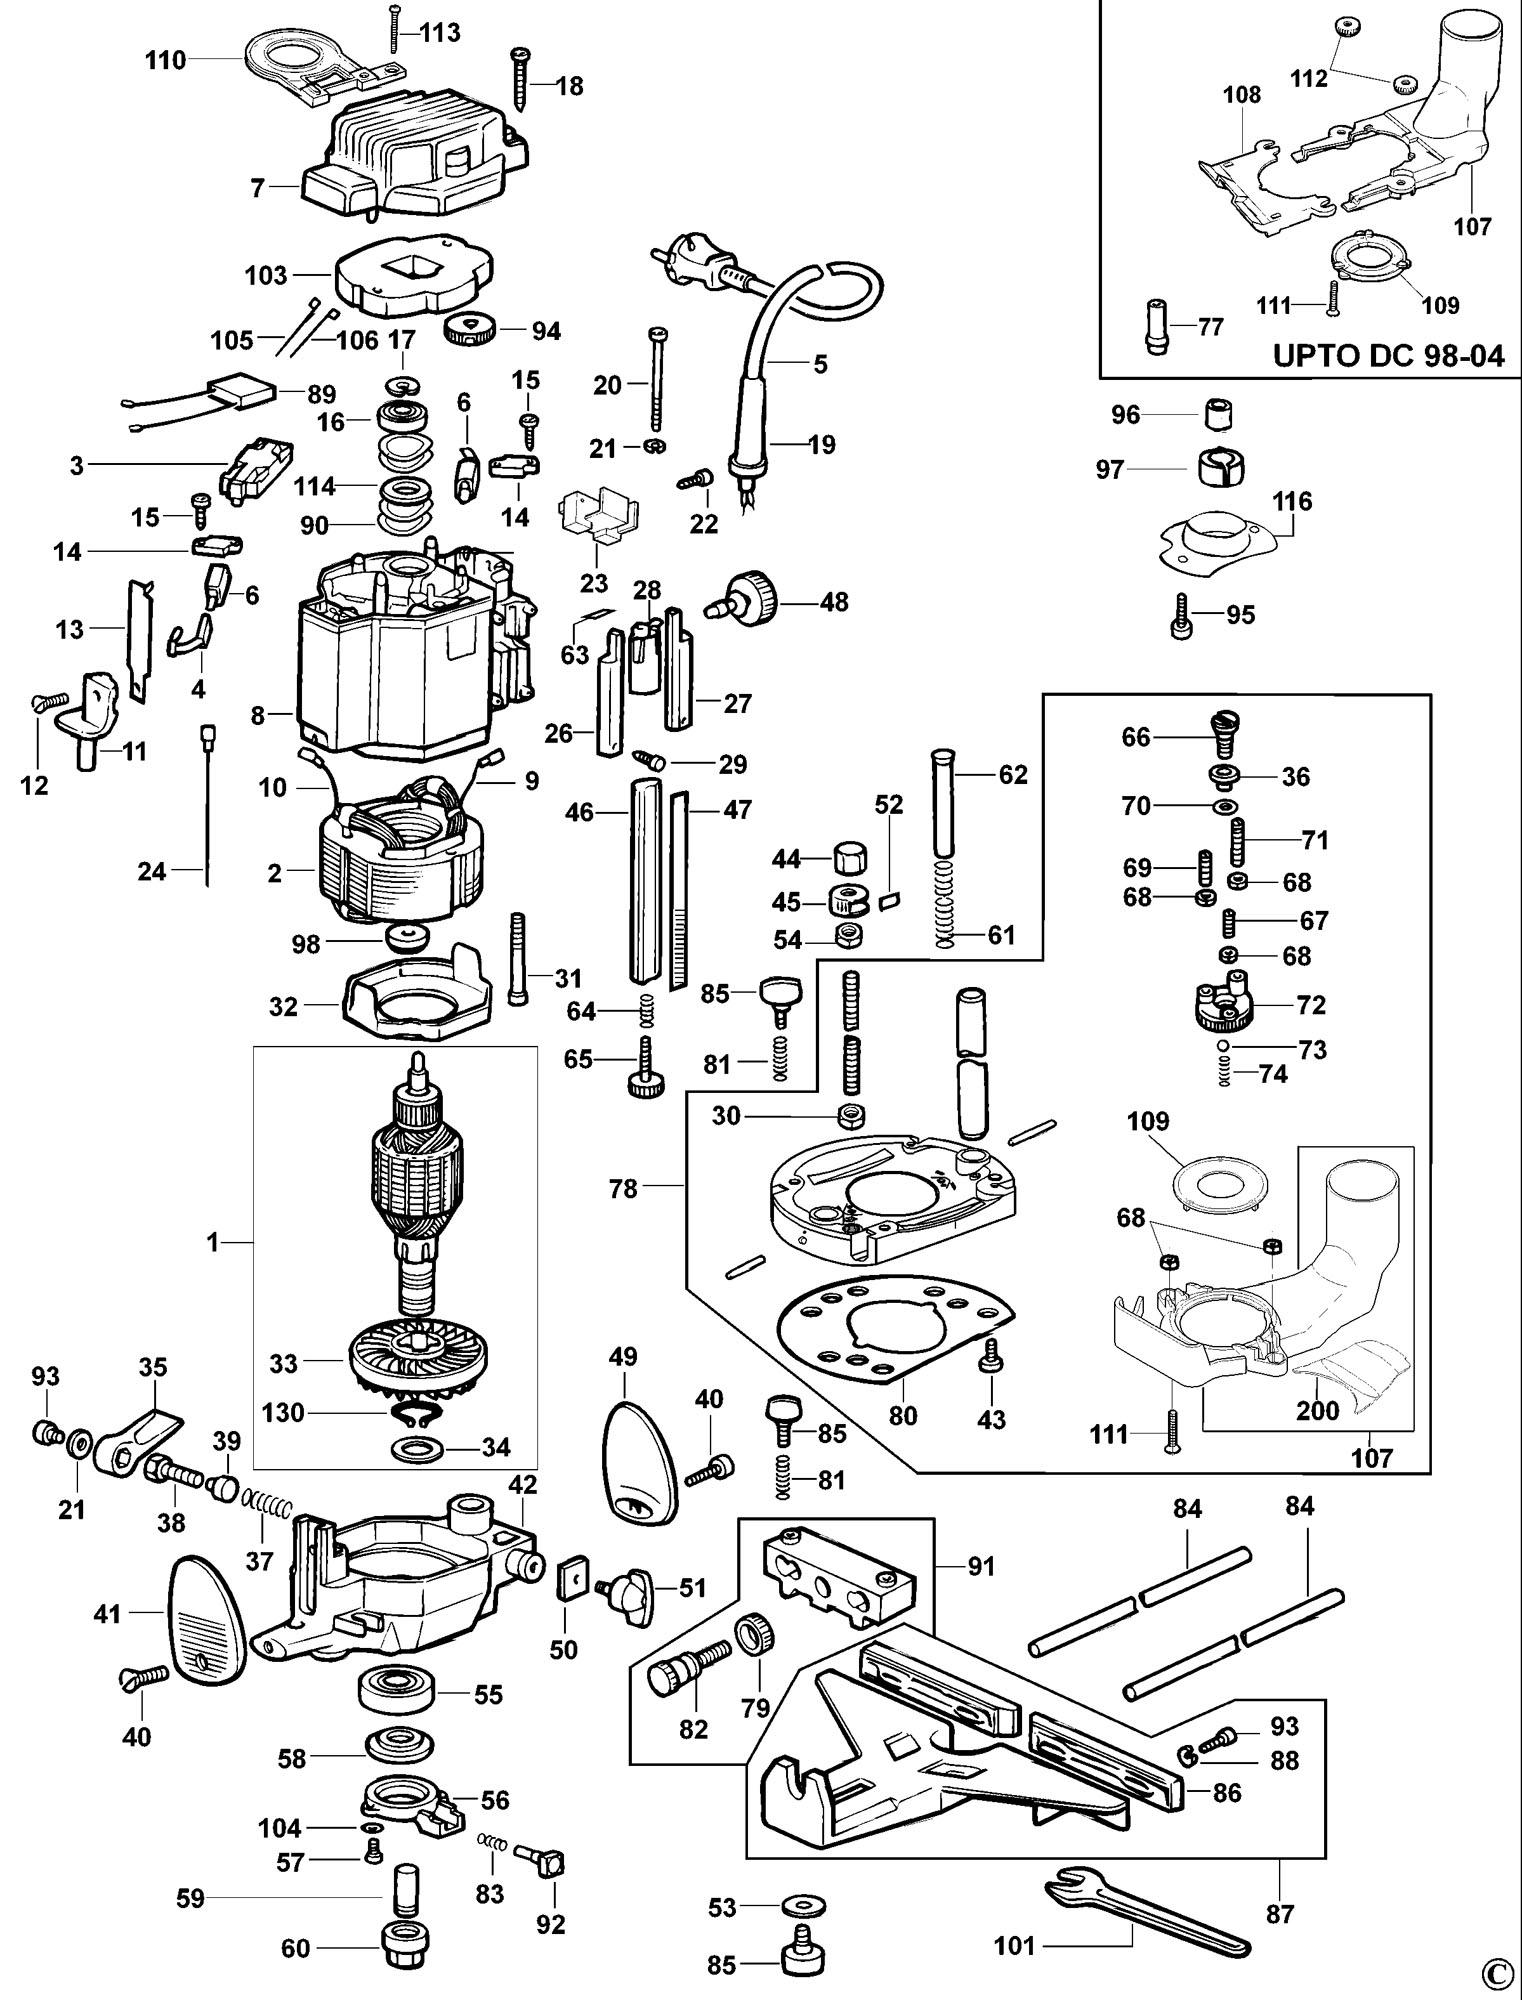 Dewalt D Power Cord Wiring Diagram